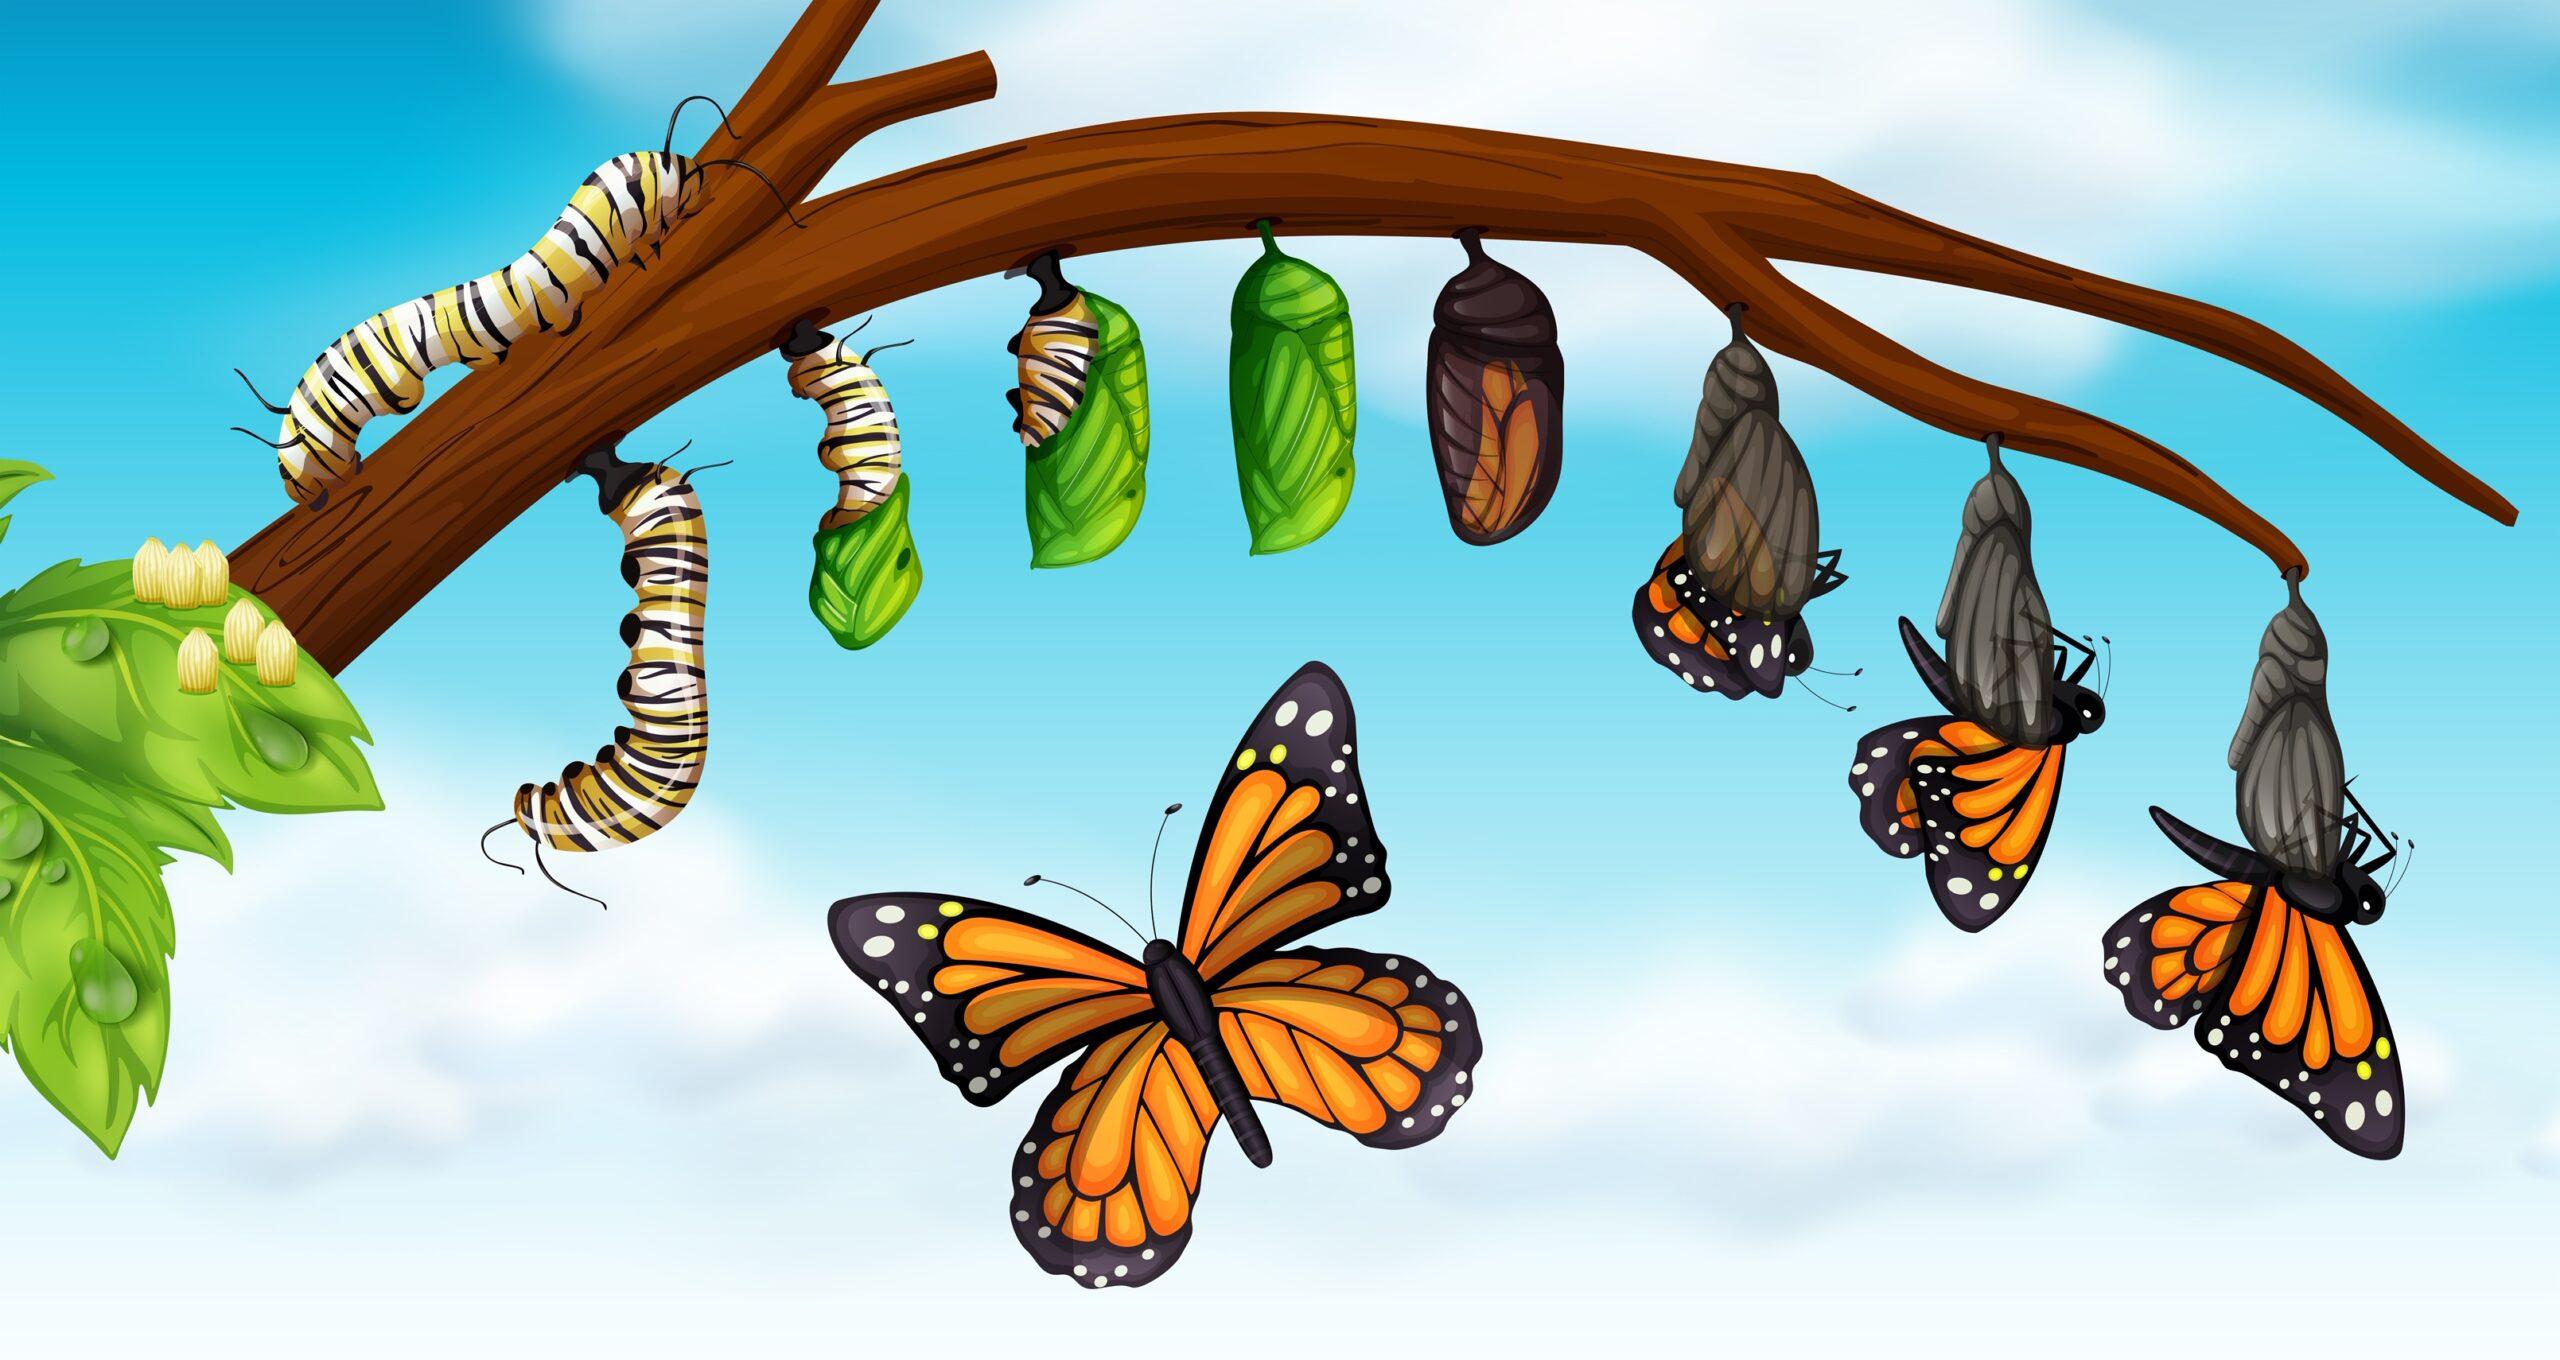 Daily Renewal, Detoxification, and Purification